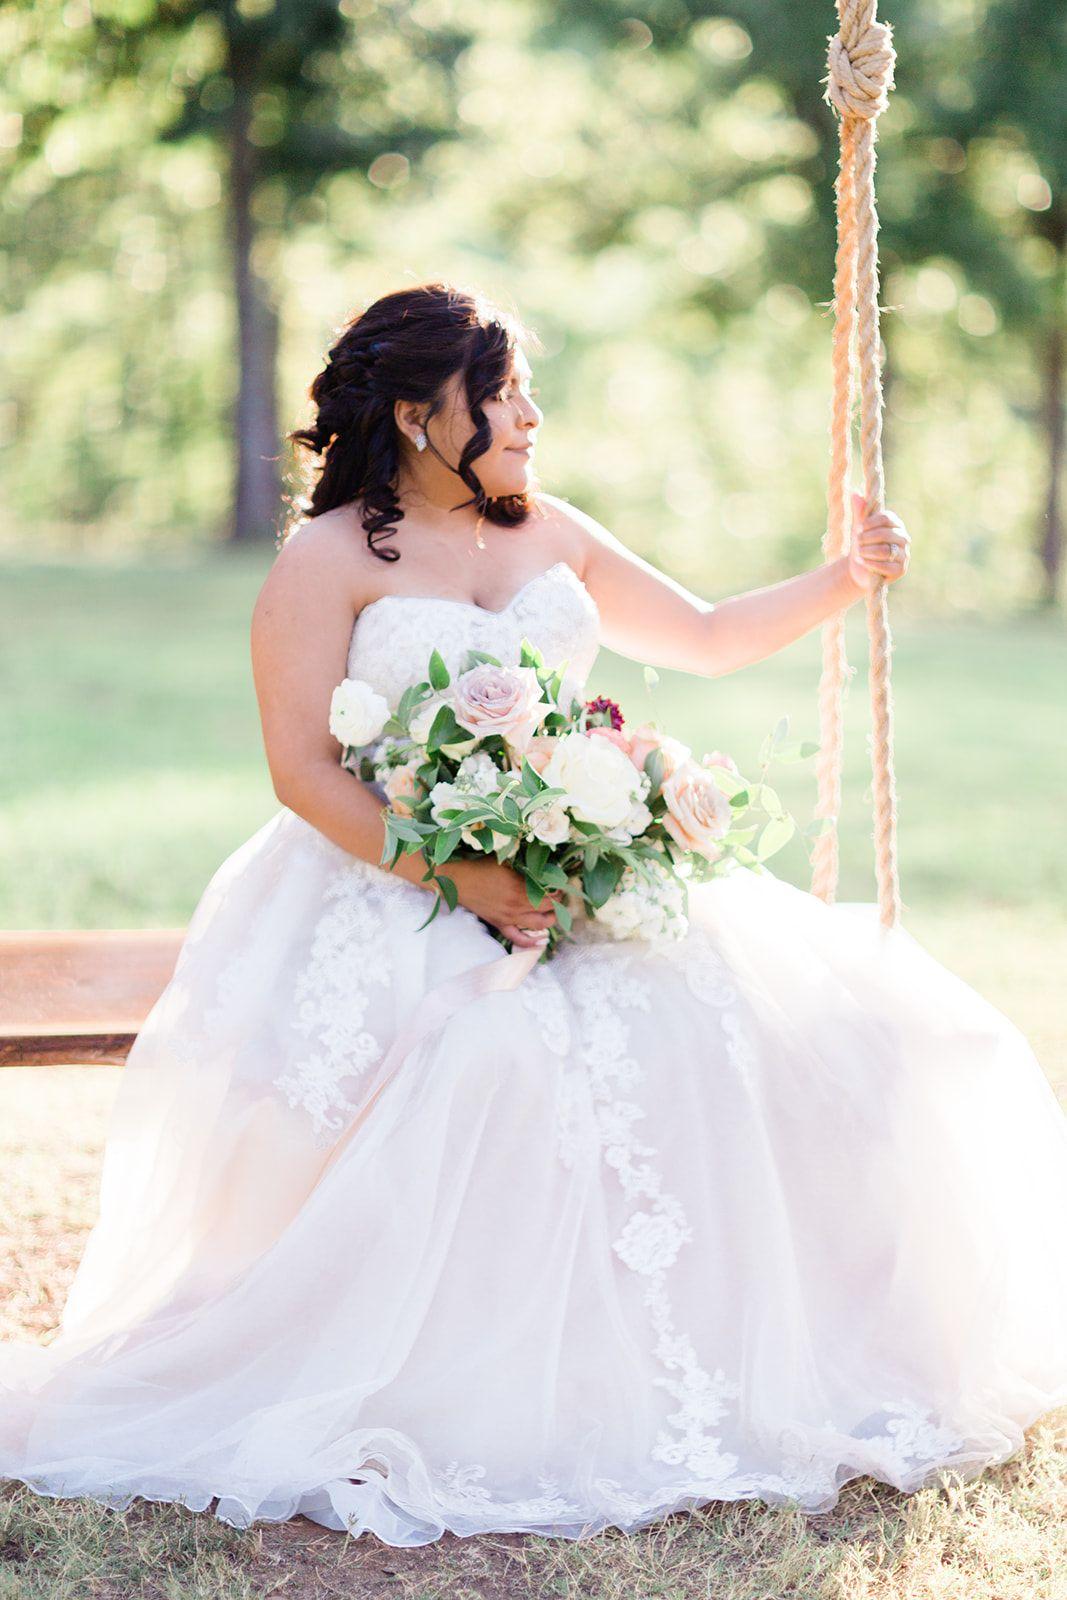 Bridal Portrait Photo Location In Tulsa Oklahoma Brides Of Oklahoma Tulsa Outdoor 2018 Wedding Dresses Trends Wedding Dresses 2018 Wedding Dress Trends